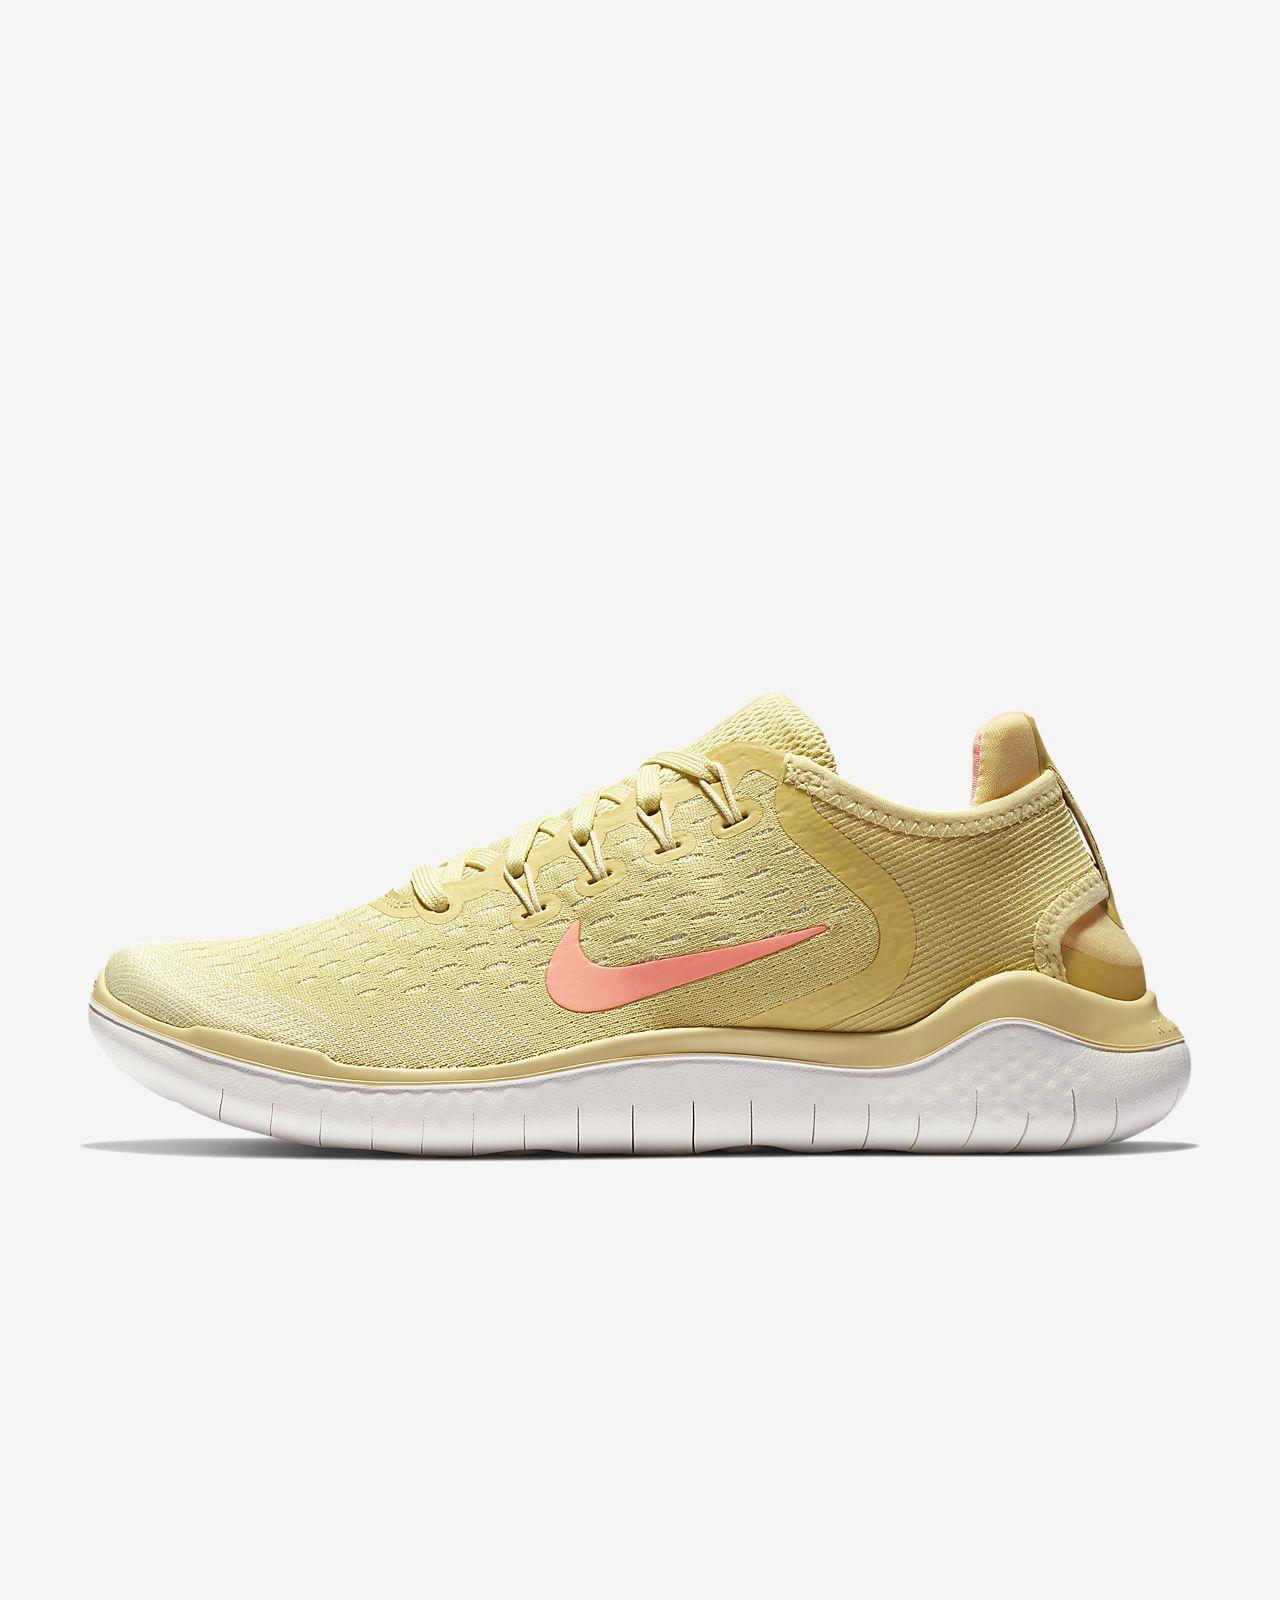 newest collection edfdb 5b24b ... Женские беговые кроссовки Nike Free RN 2018 Summer 96165 80505 . ...